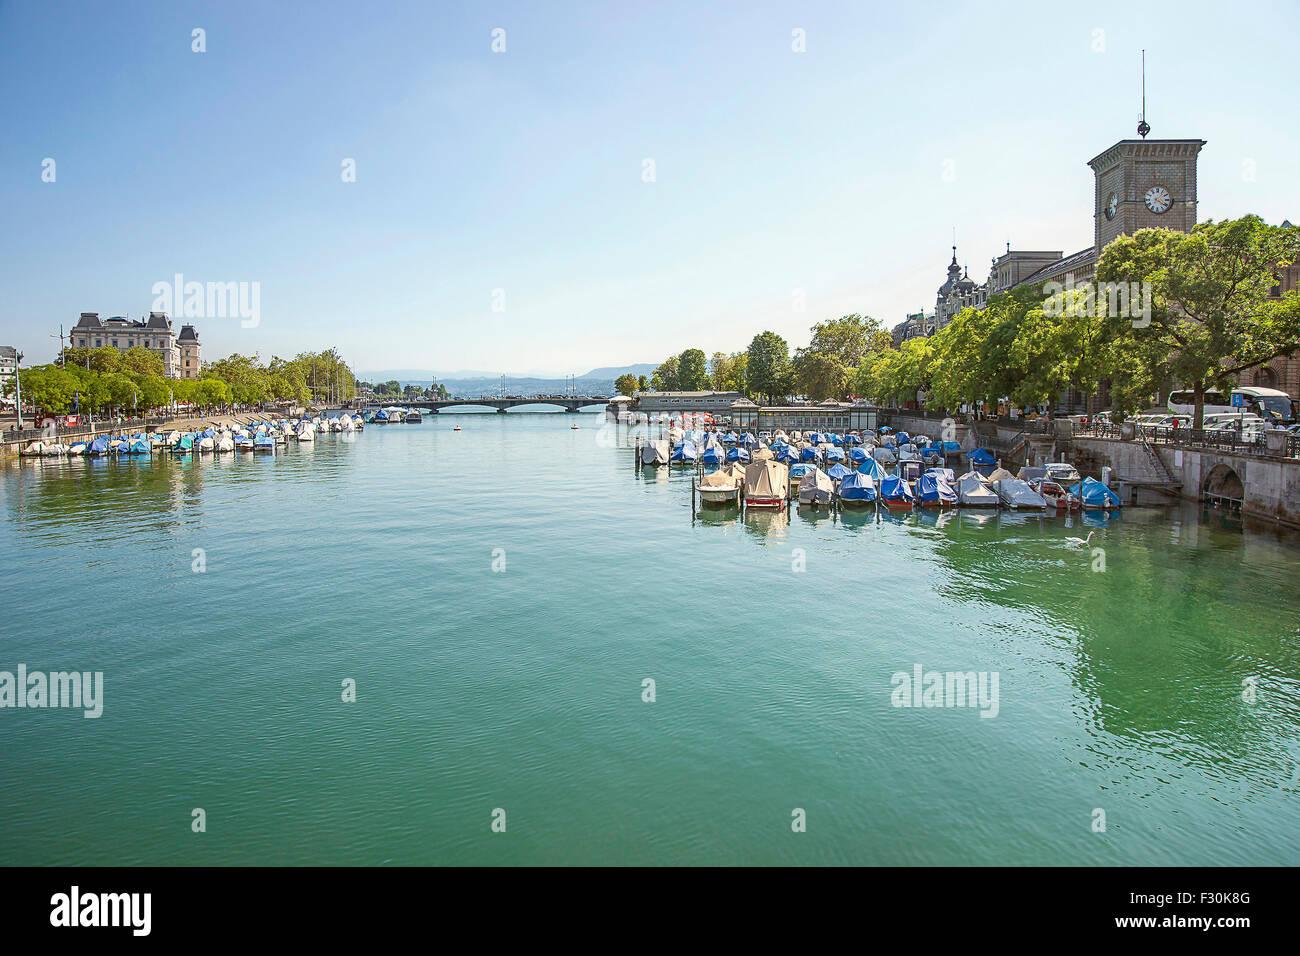 Zurich city center and Limmat quay harbor in summer, Switzerland - Stock Image